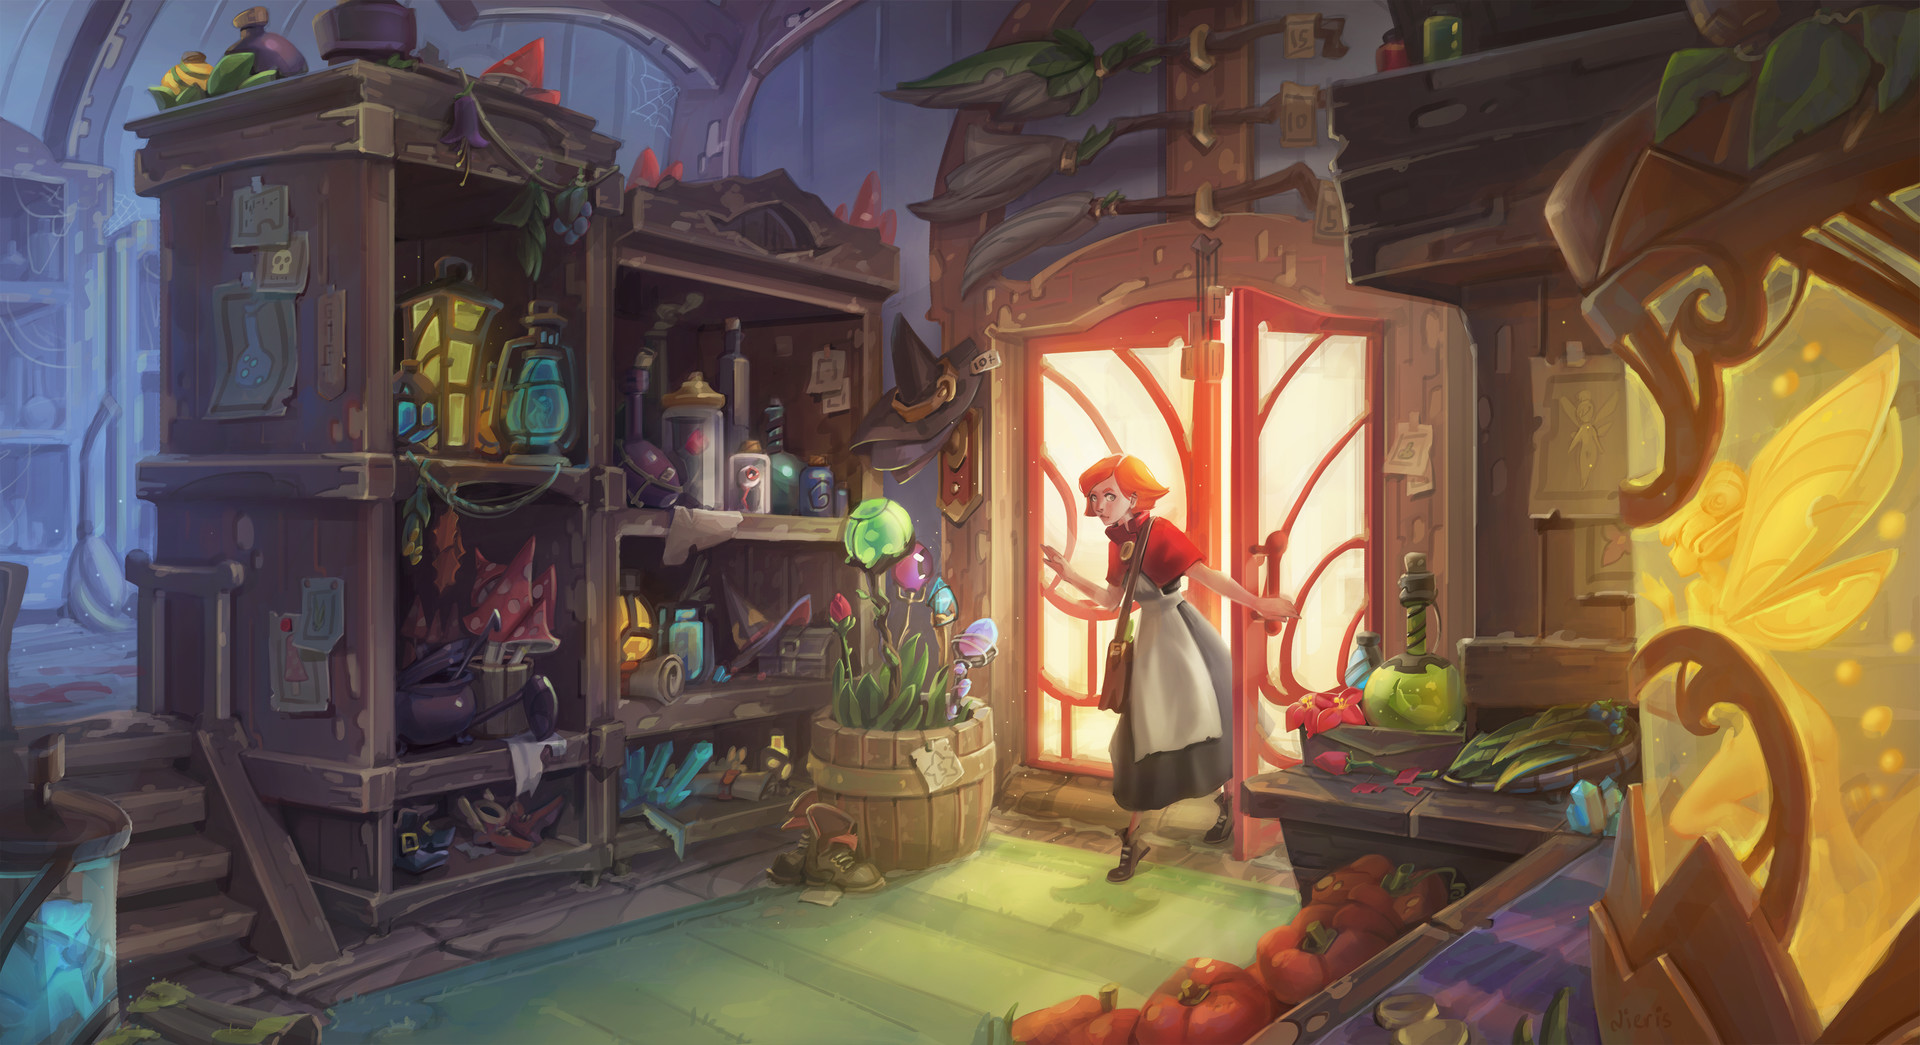 Artstation - Magic Veronika Firsova